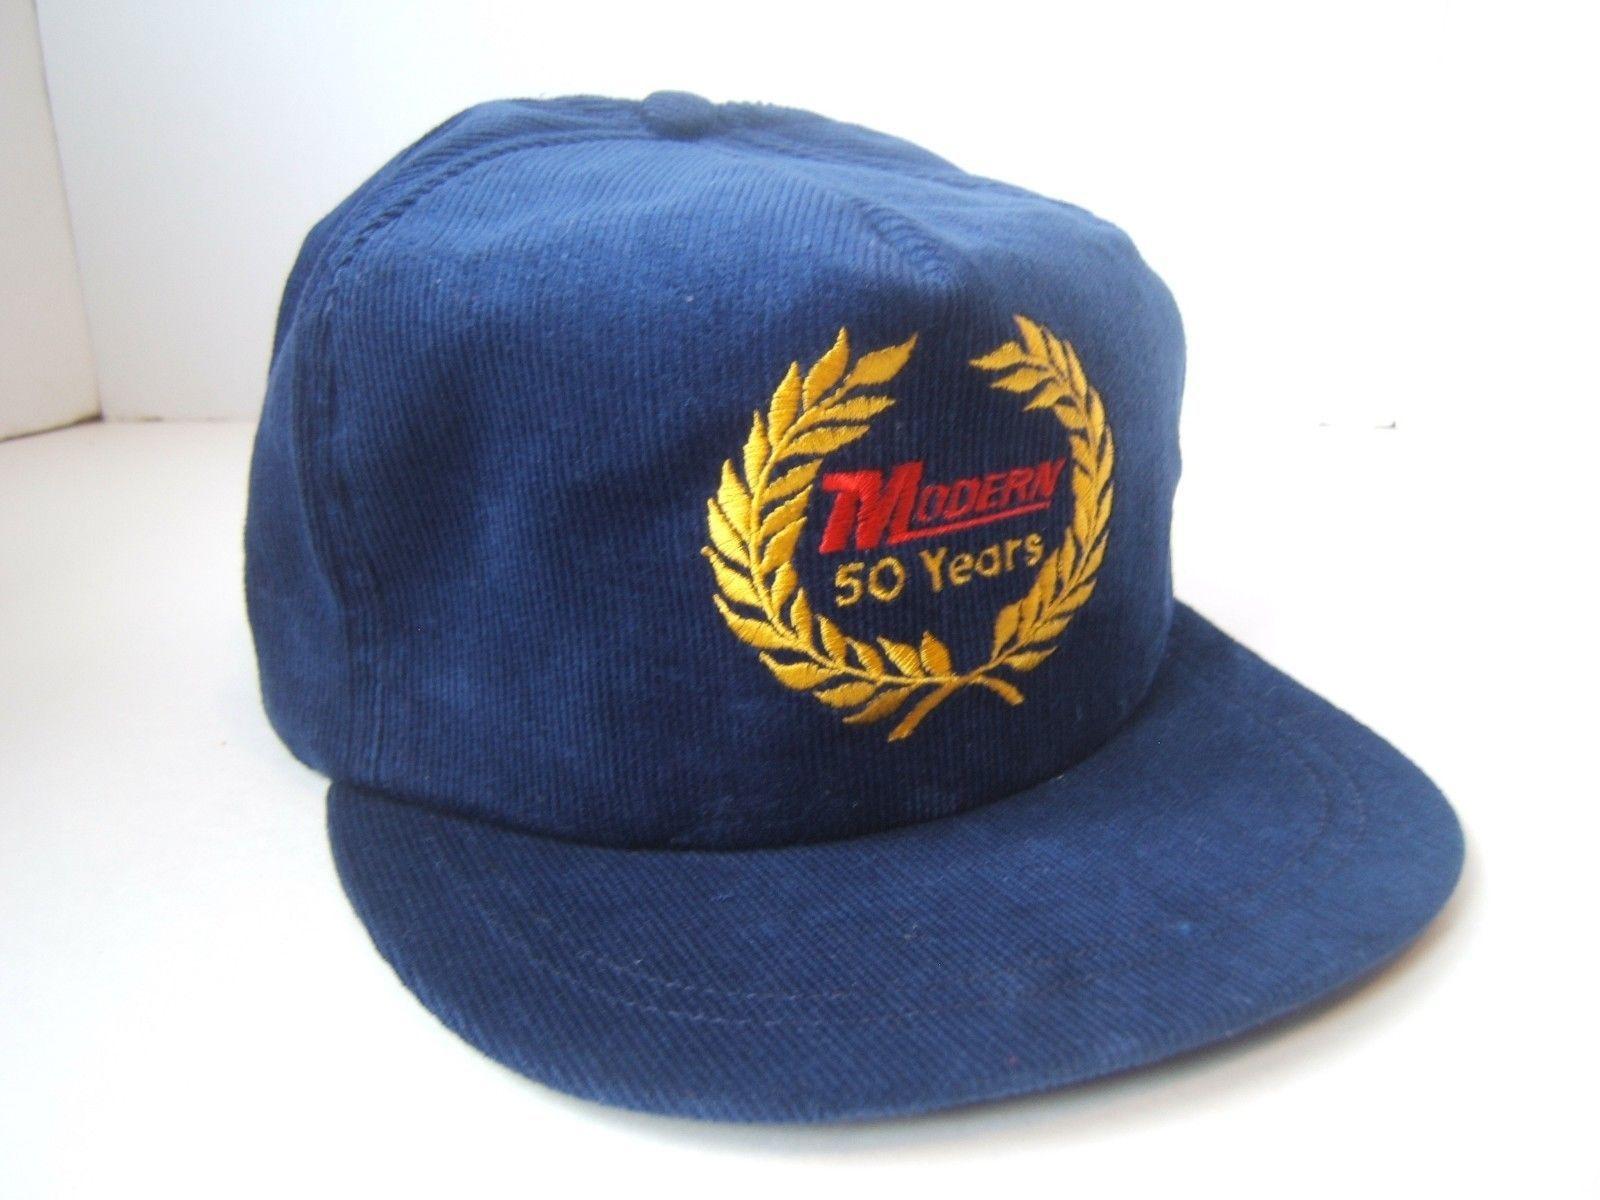 1a0133edb Vintage Modern 50 Years Hat Blue Corduroy and 50 similar items